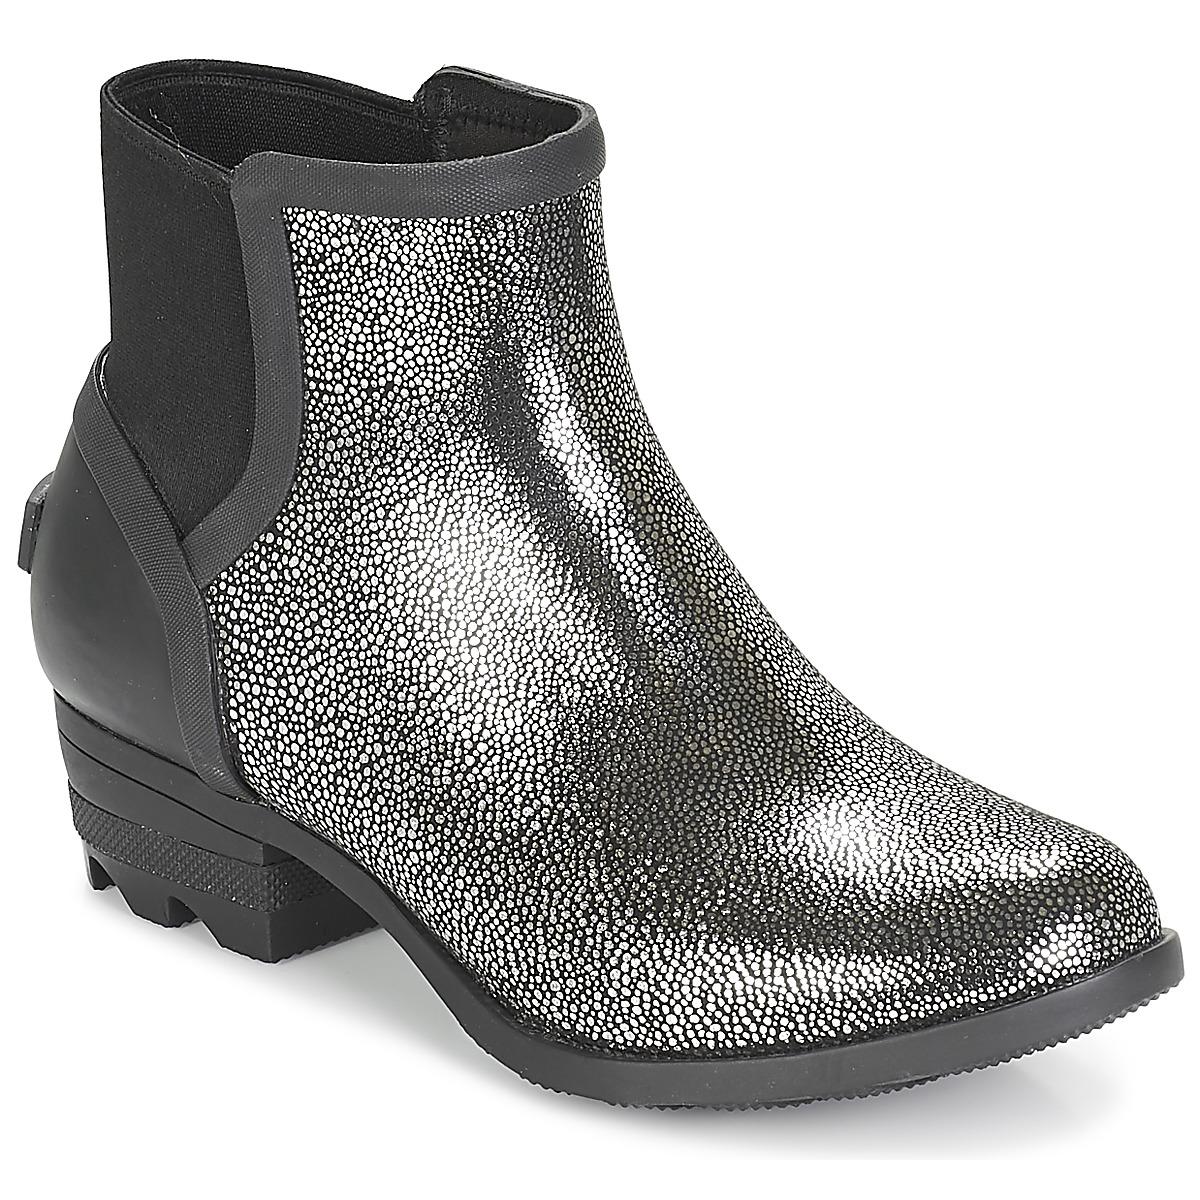 Sorel Womens Janey Chelsea Boot